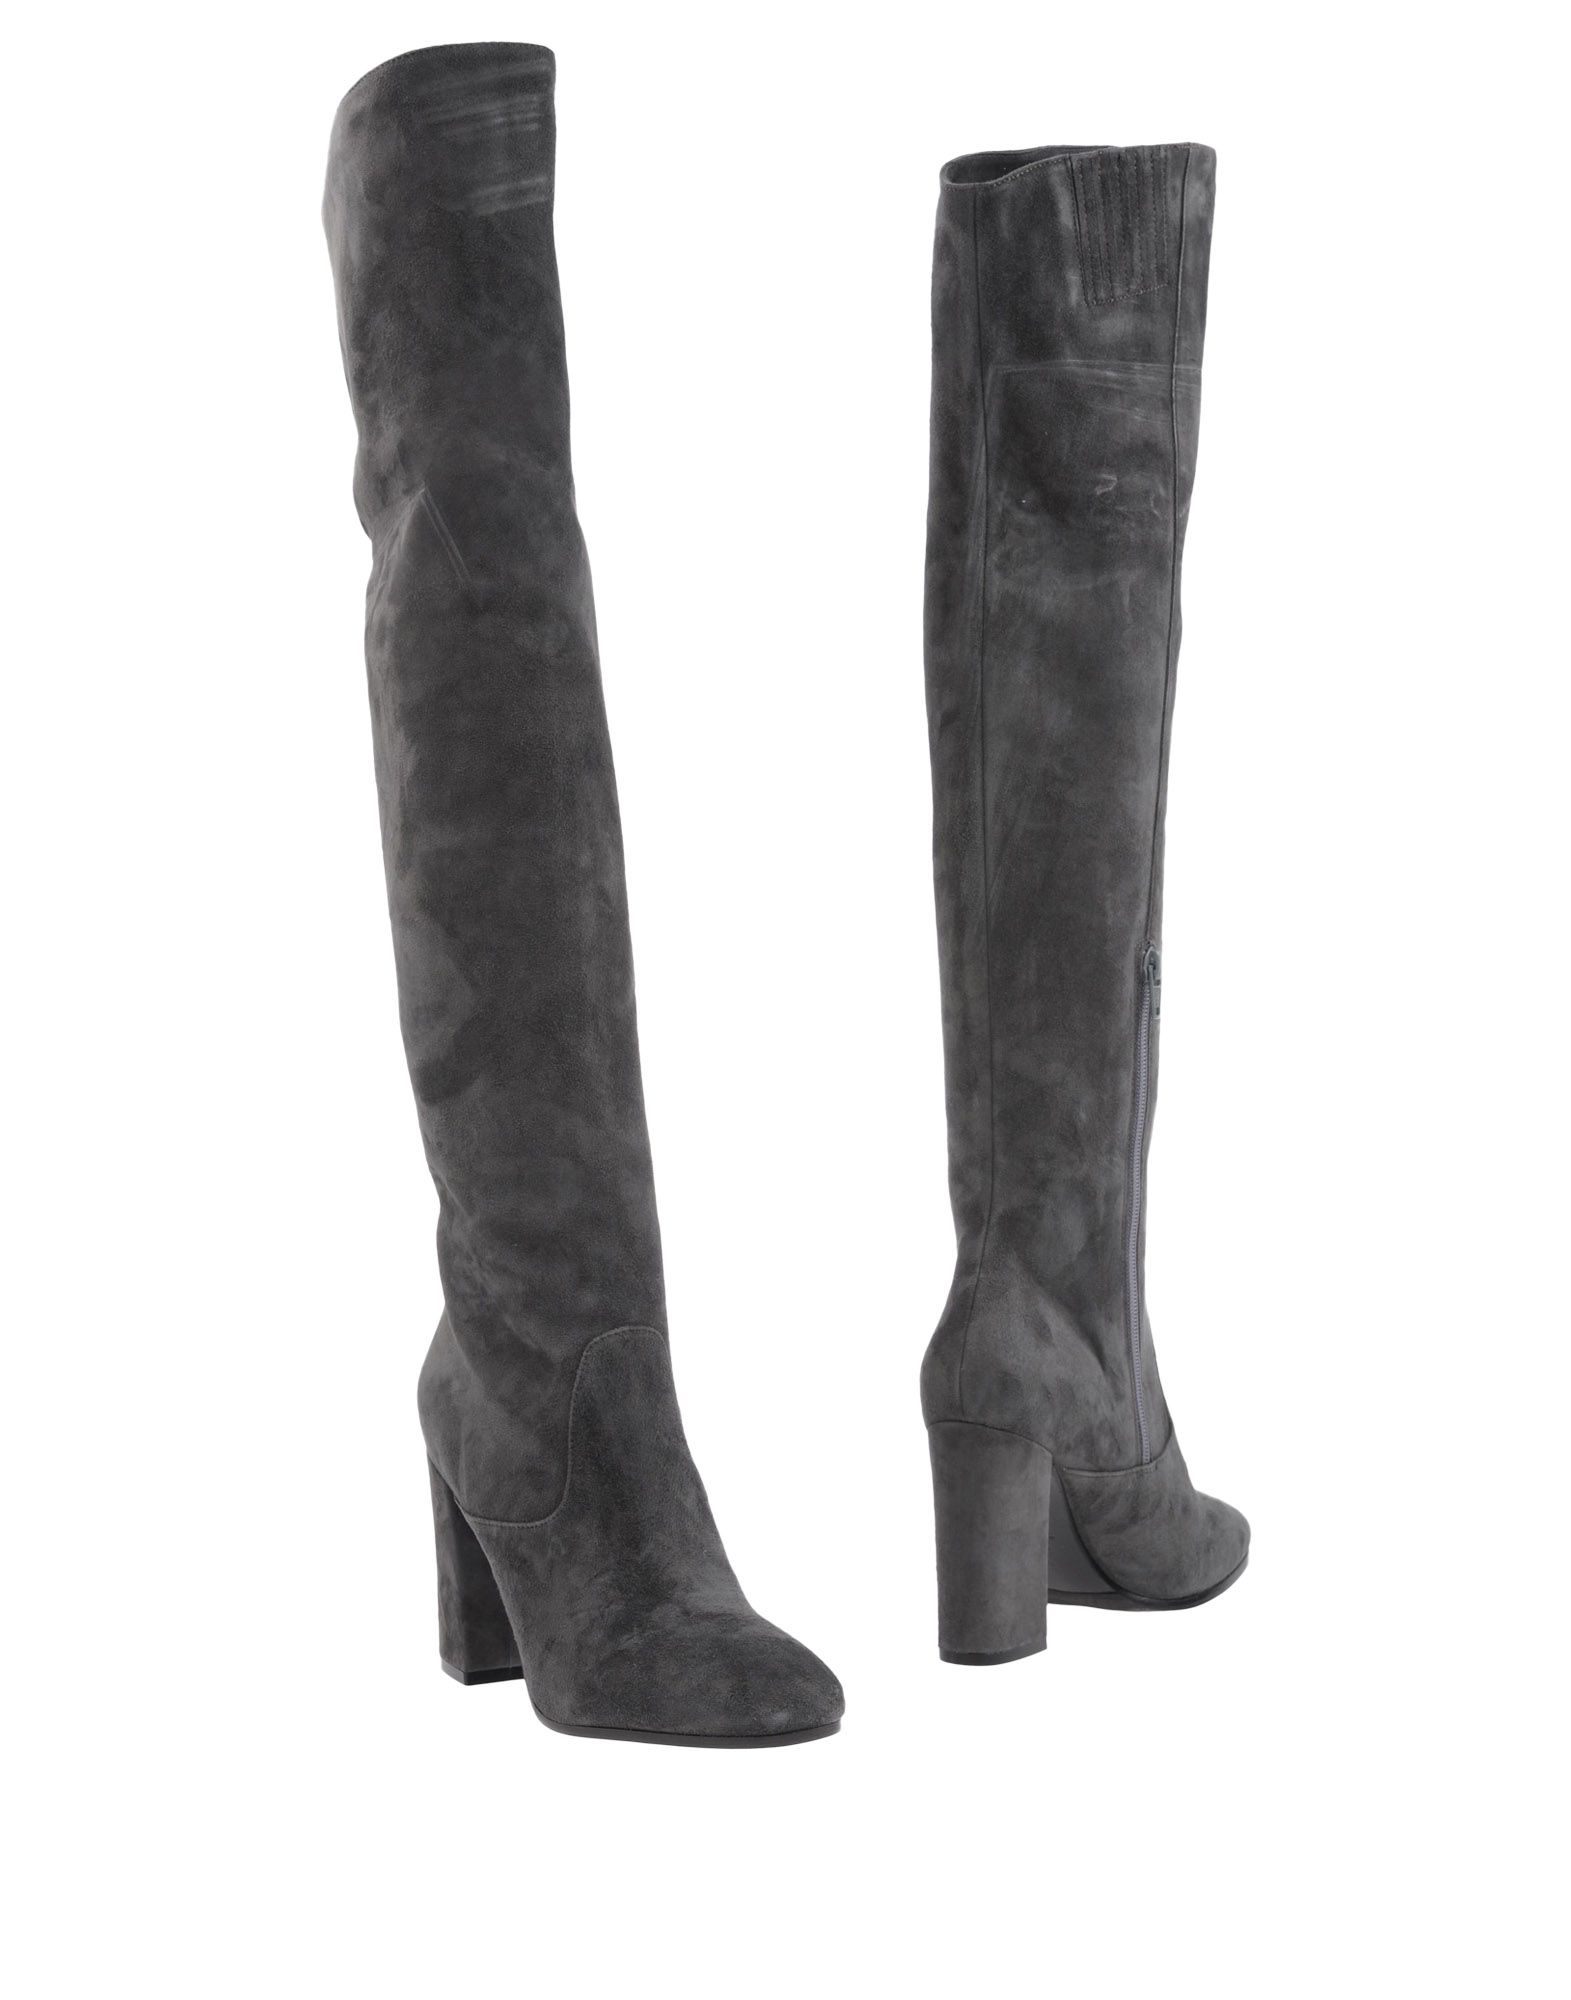 Moda Stivali Spaziomoda Donna - 11225055RK